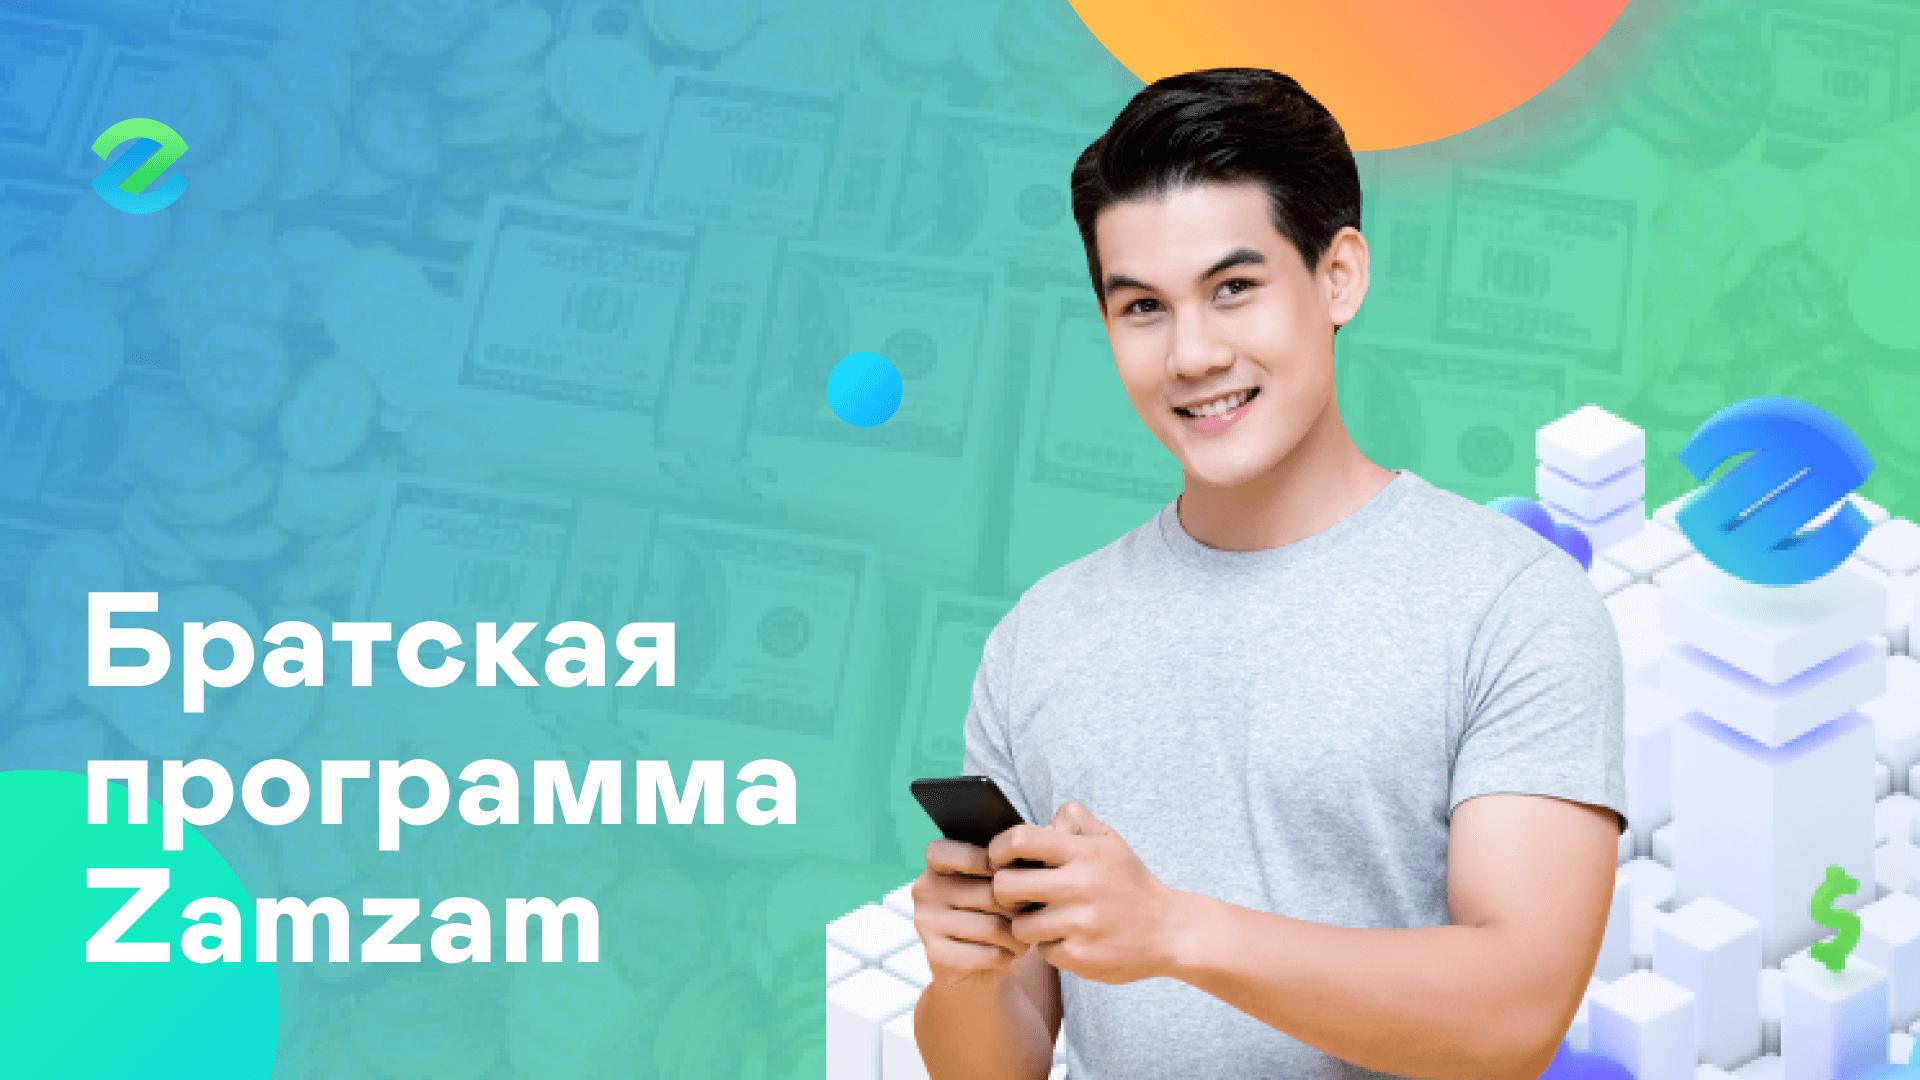 bratskaja programma zamzam - Братская программа Zamzam